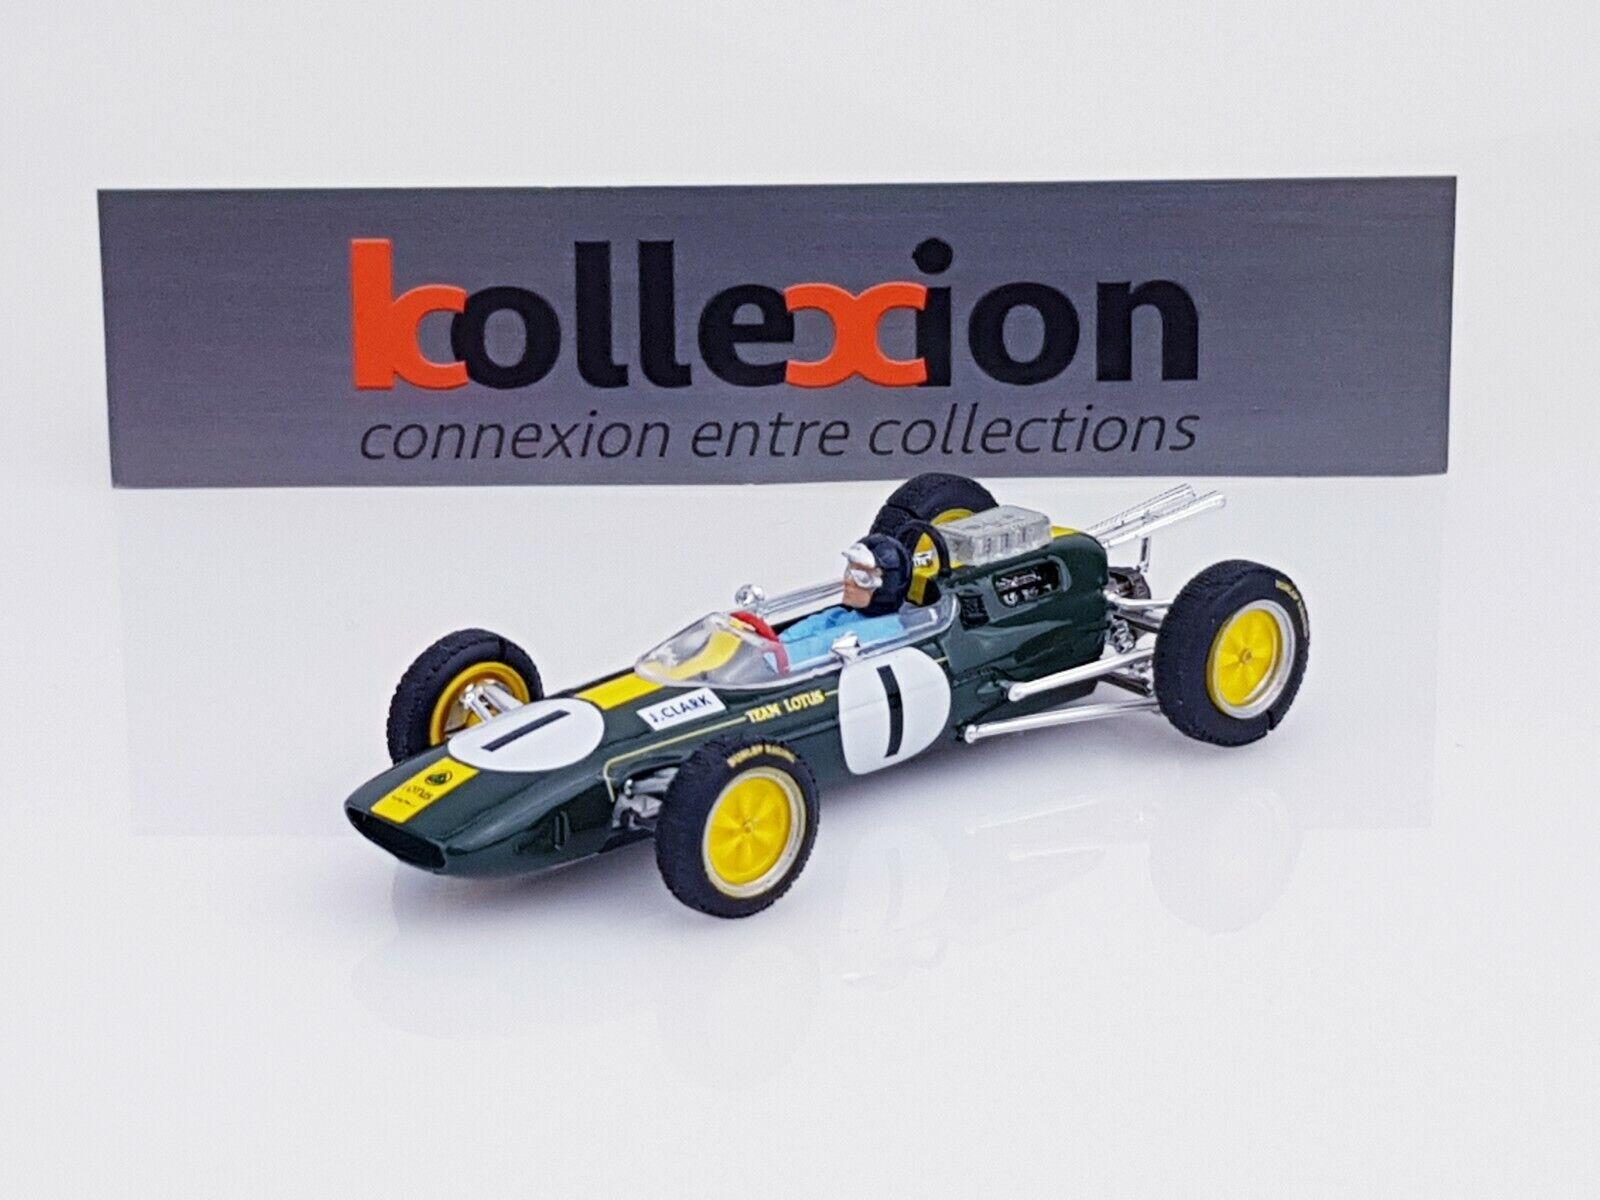 BRUMM S08 26 LOTUS 25 n°1 Winner British GP 1964 Jim Clark 1.43 NB